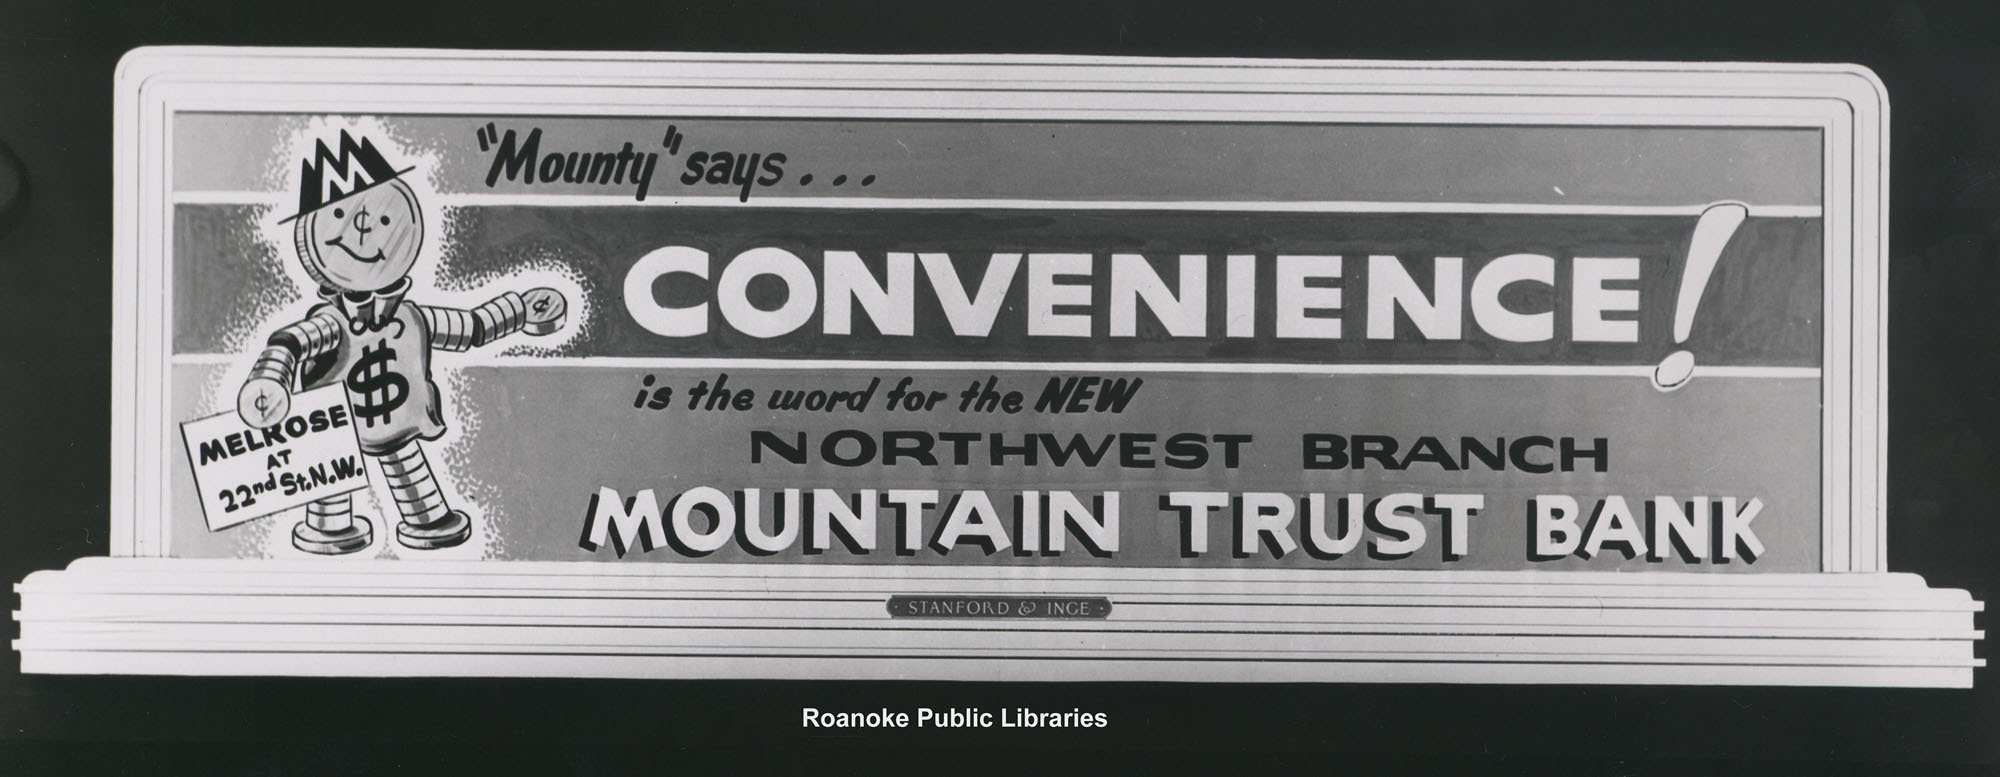 Davis 43.3211 Mountain Trust Bank Billboard.jpg